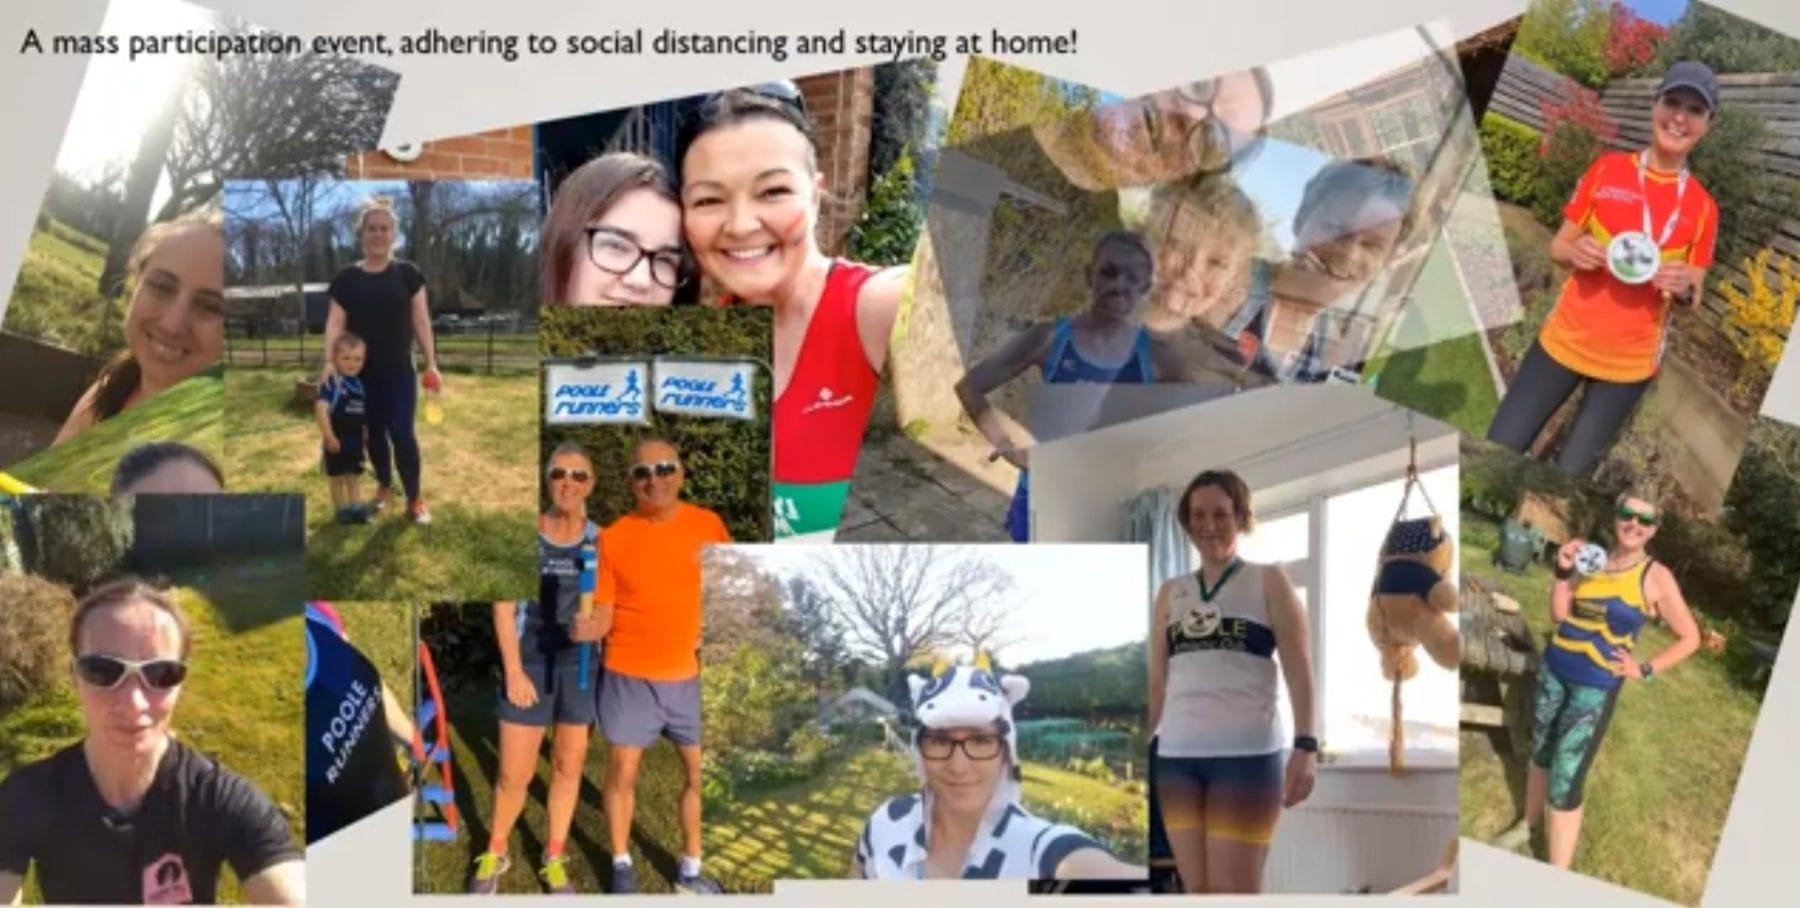 Abigail Baker (top left) and Rose Clarke (bottom right) in the Garden Marathon Challenge online collage